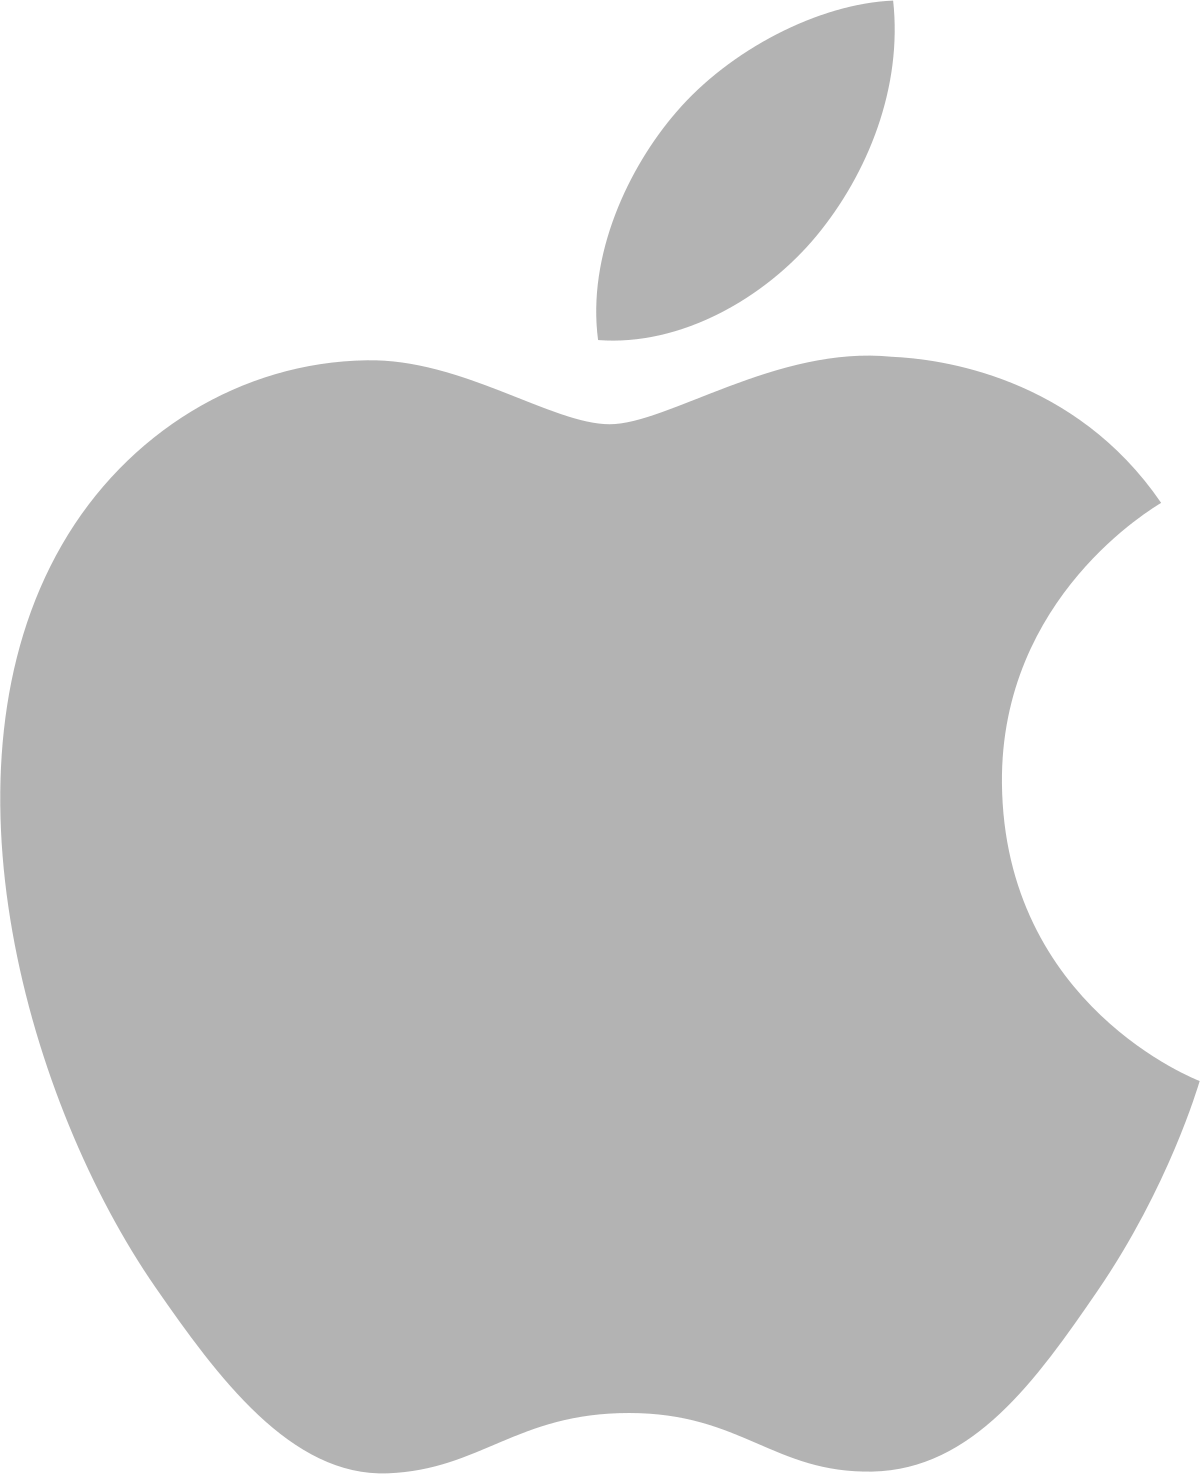 :apple_inc: